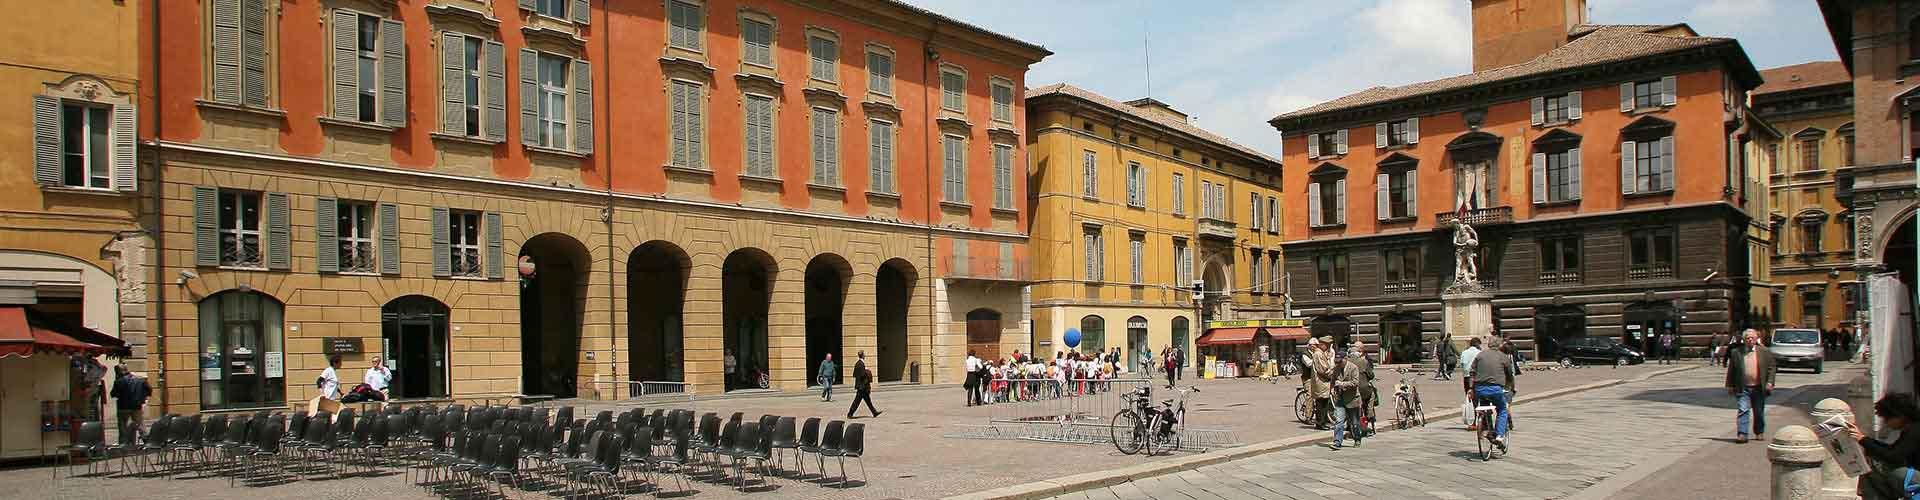 Reggio Emilia – Hostellit kohteessa Reggio Emilia. Reggio Emilia -karttoja, valokuvia ja arvosteluja kaikista Reggio Emilia -hostelleista.